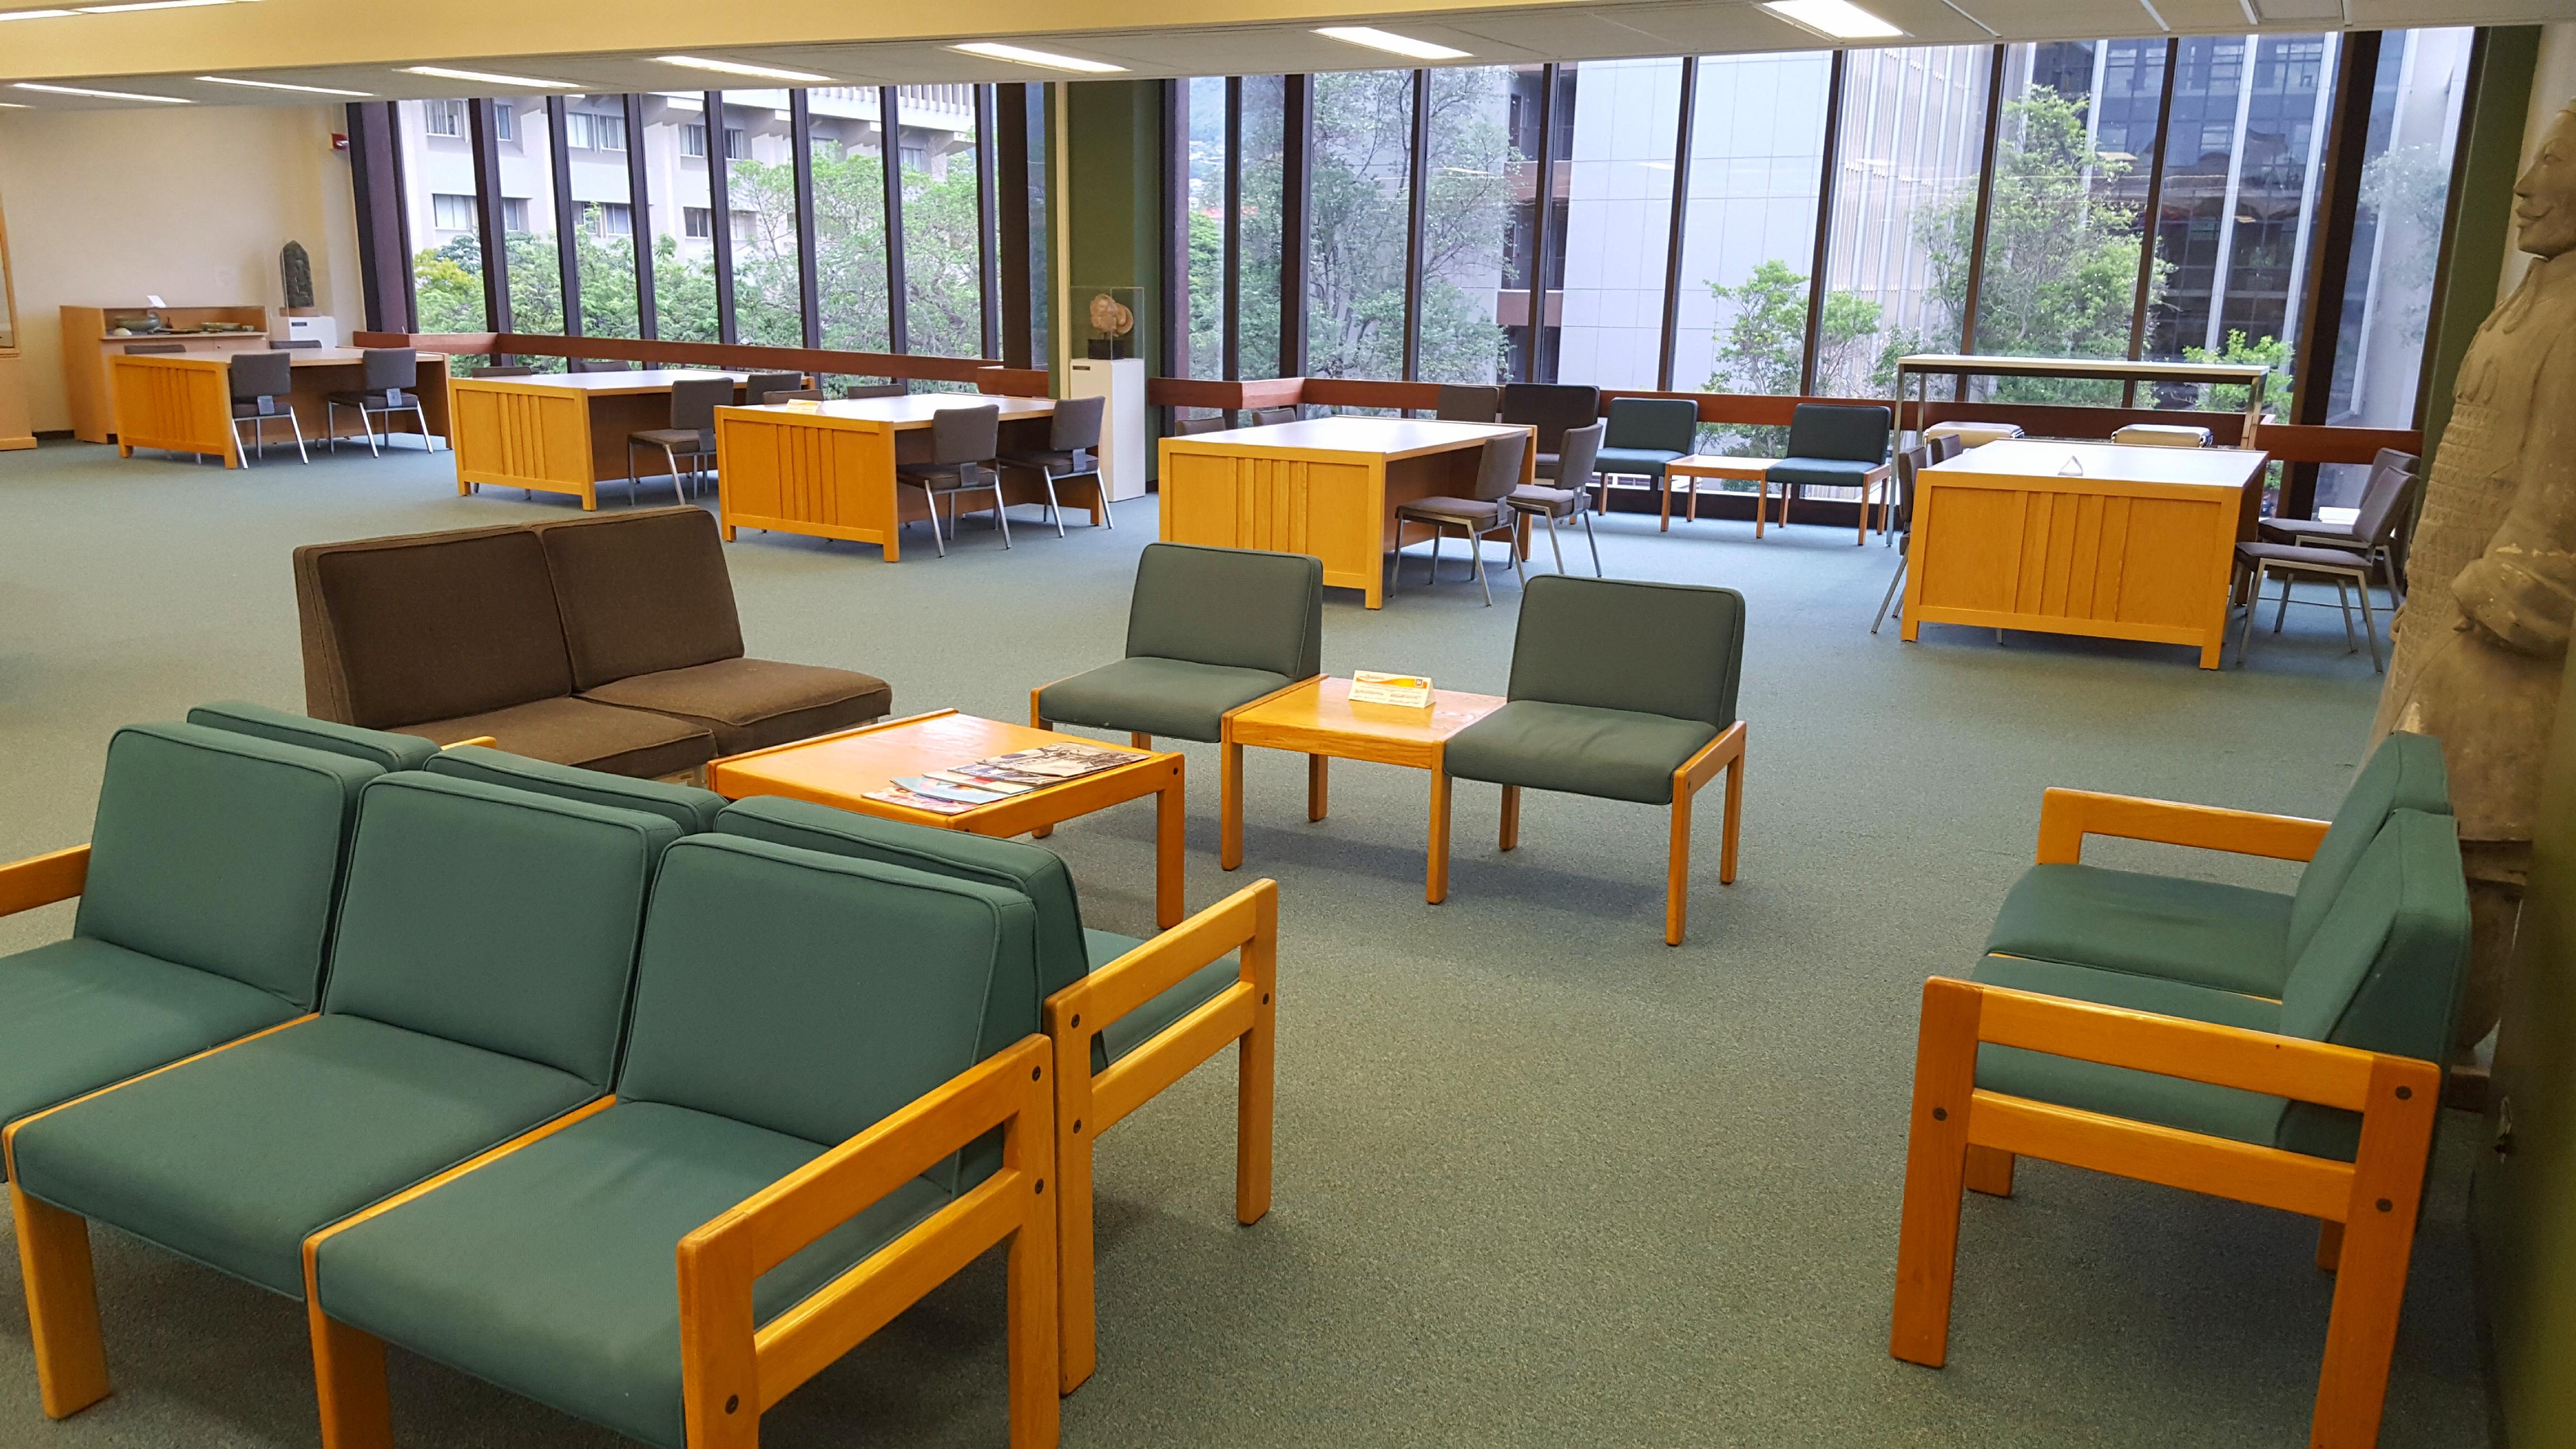 Hamilton Library Fourth Floor Study Space